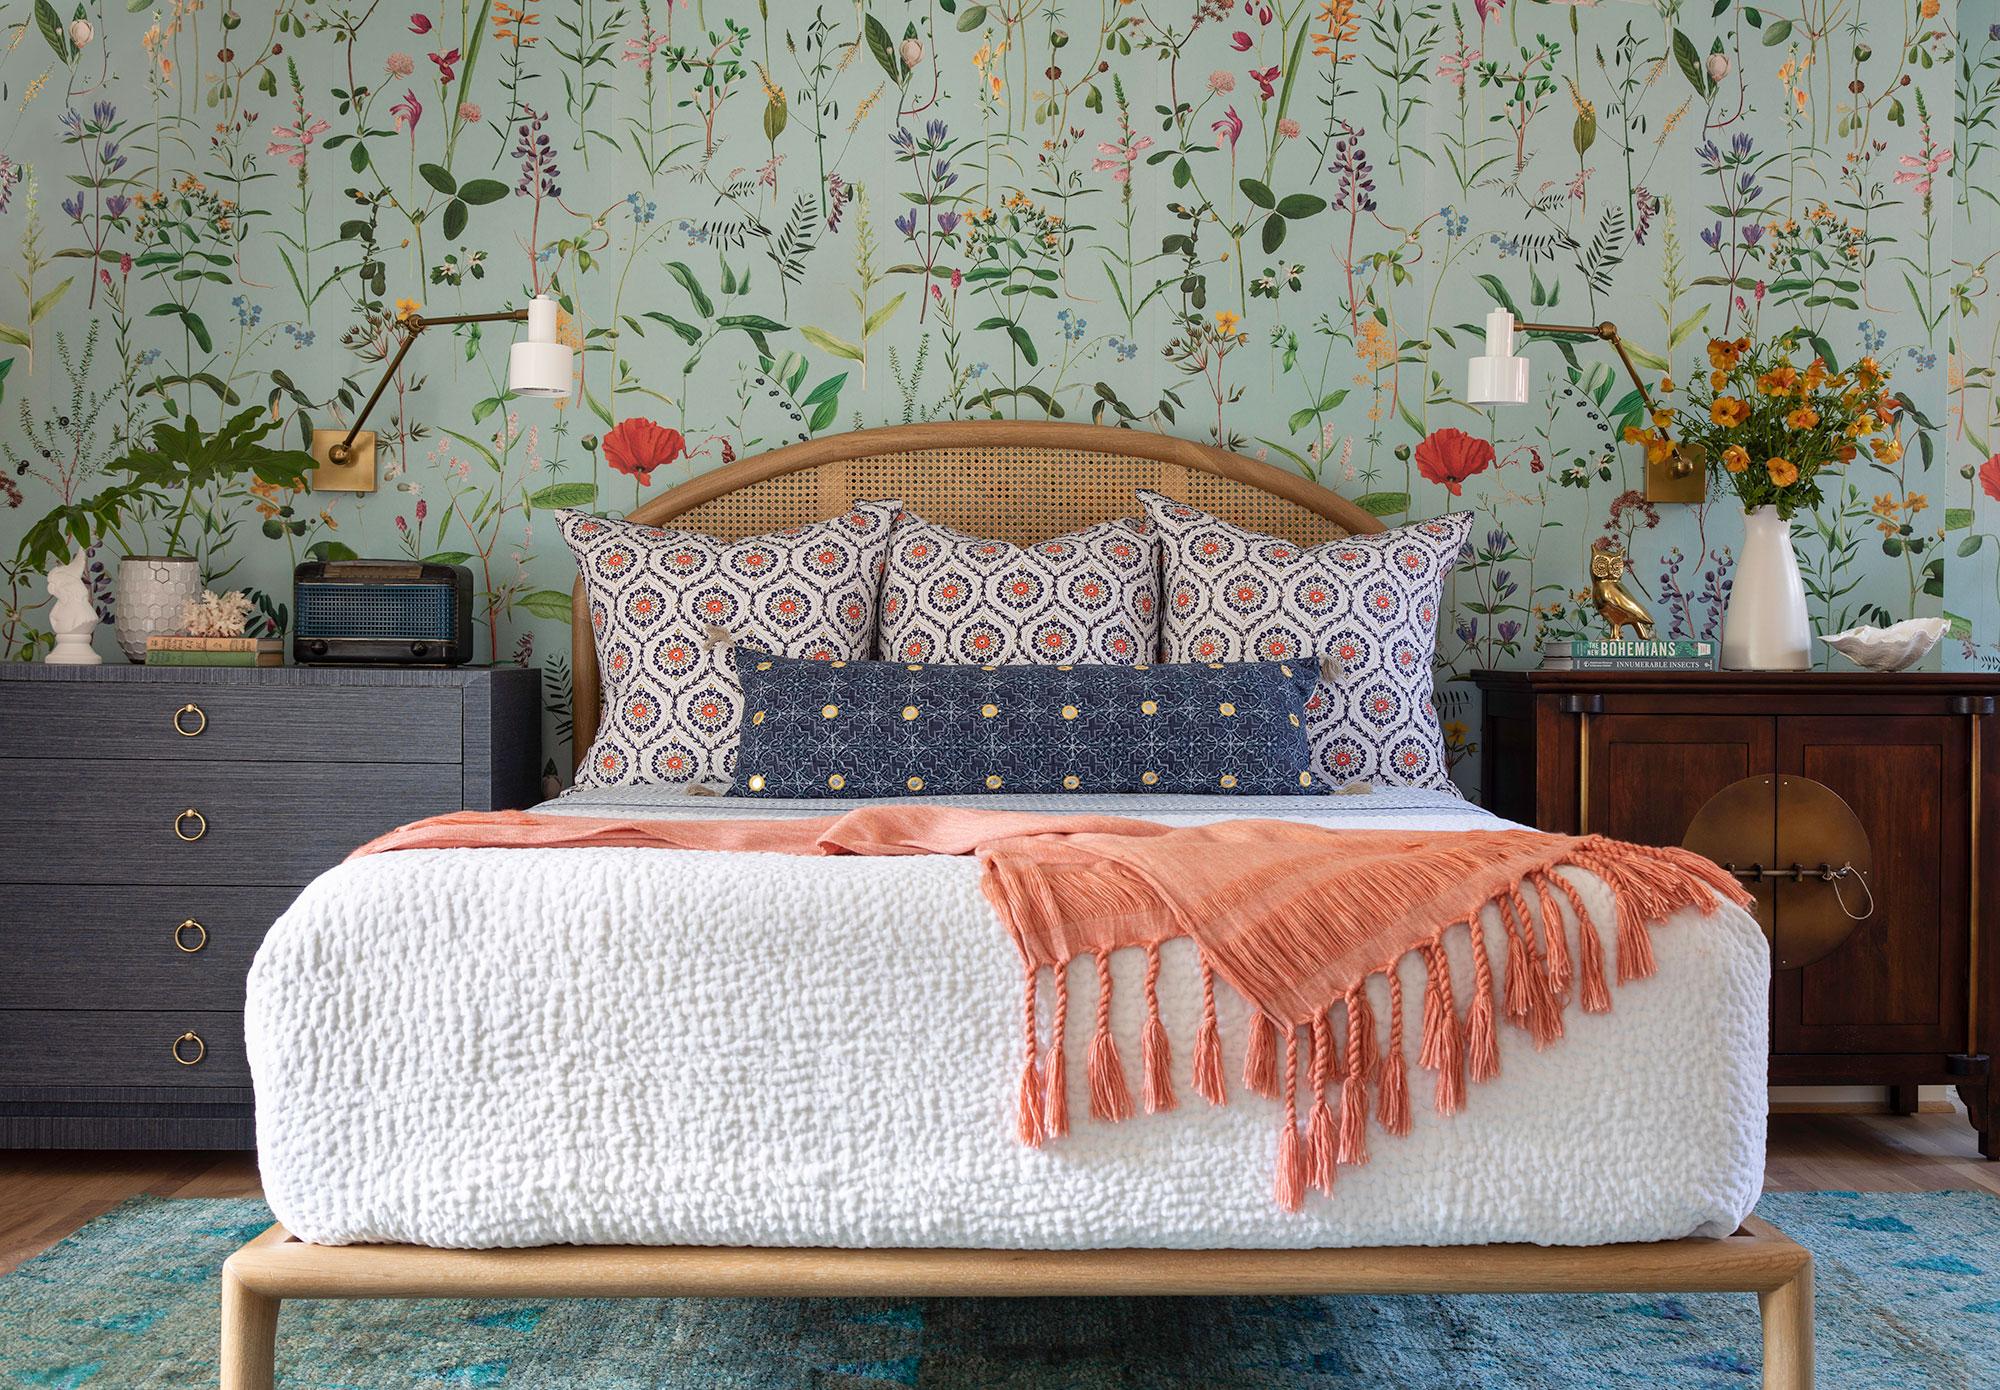 Emily-Spanos---1-Naturalist-at-Rest-Bedroom-Retreat.jpg